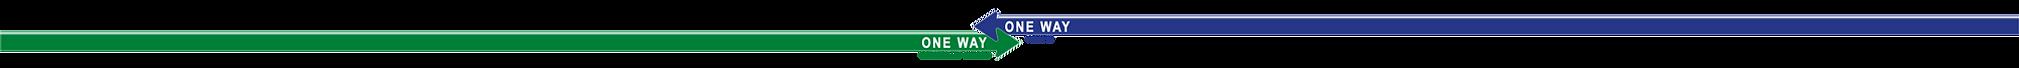 LogoBarNav.png